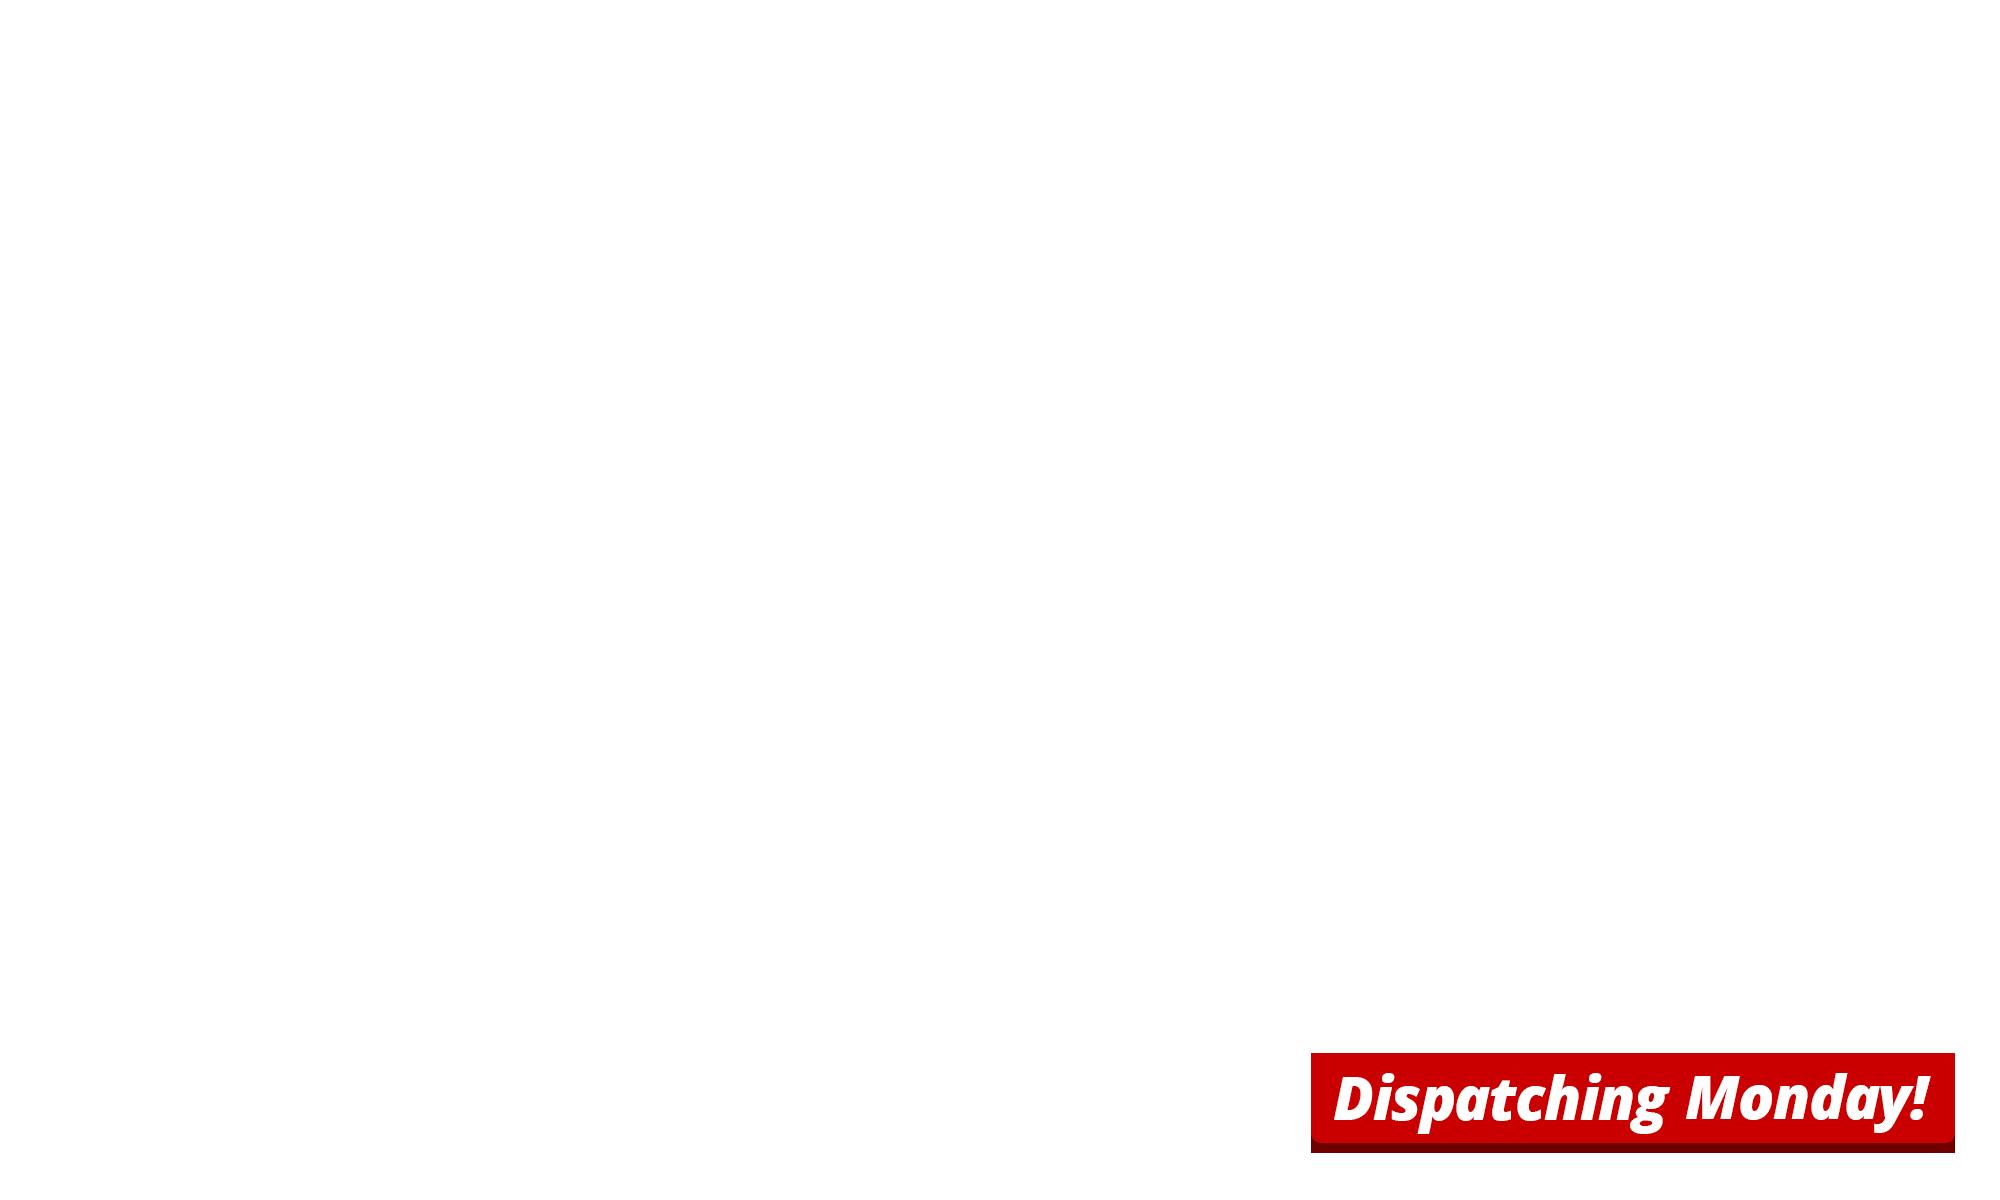 Dispatching monday overlay